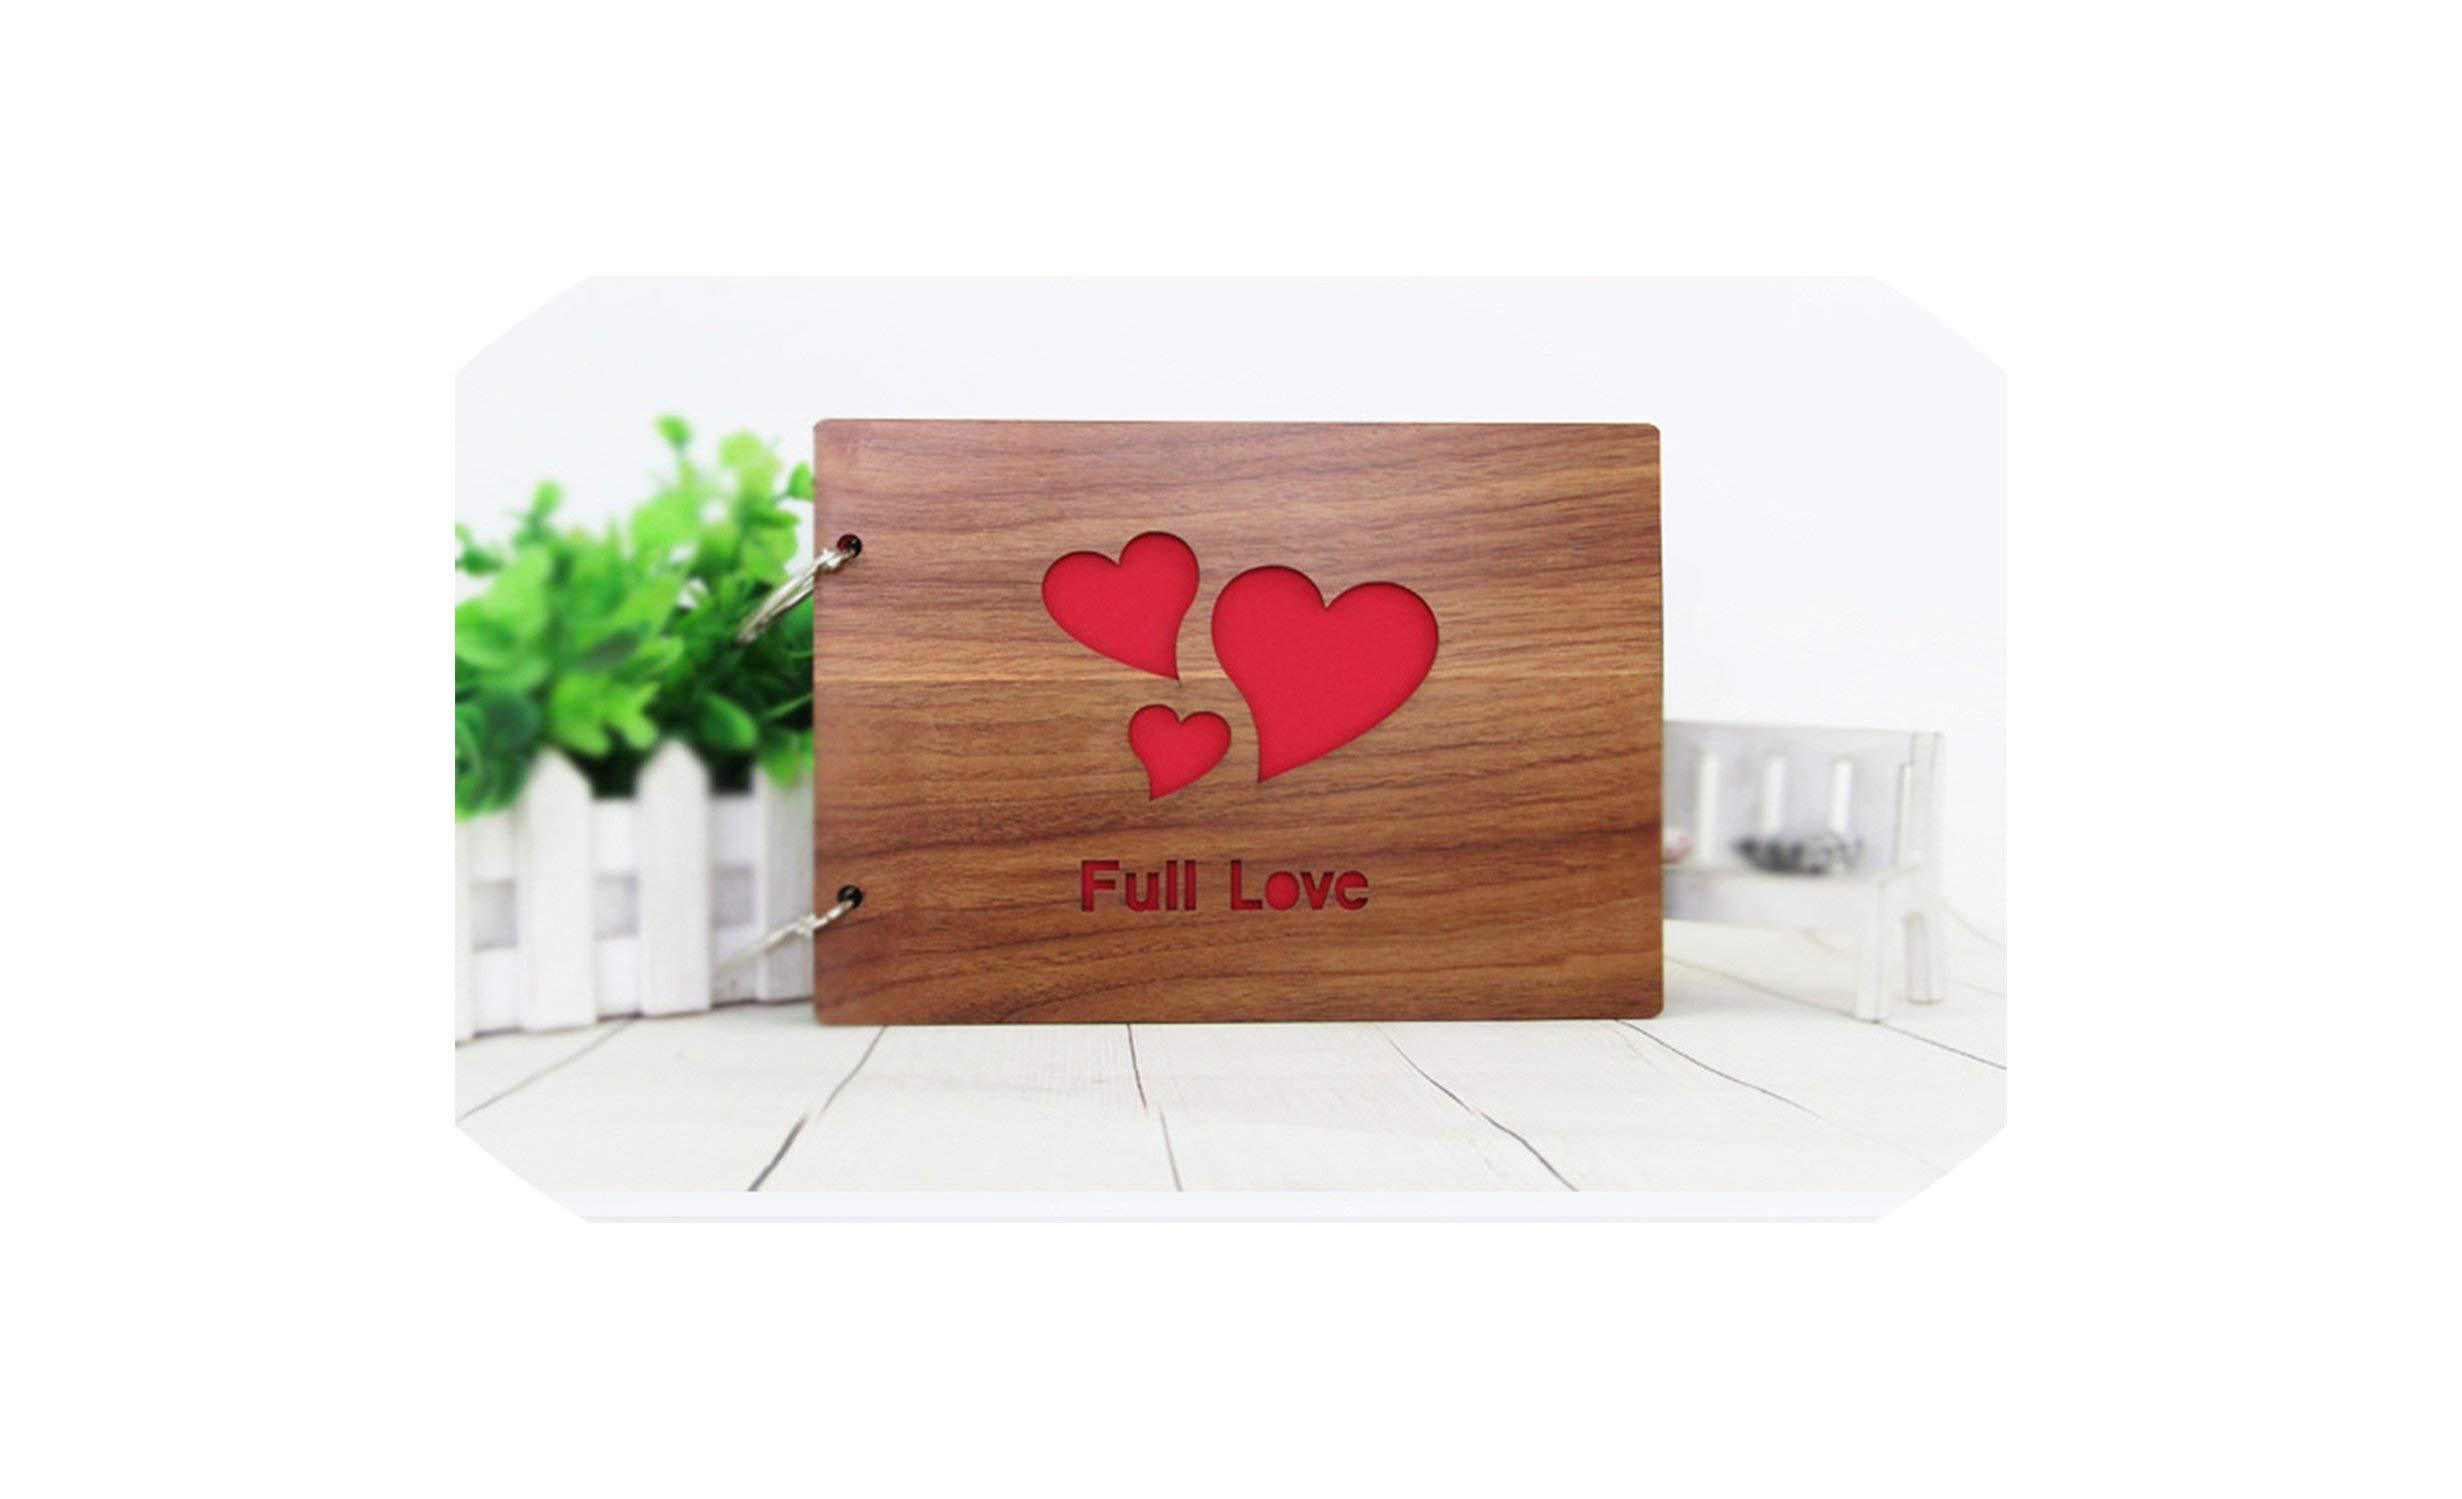 Photo Album Black Cardboard Wood Creative Handmade Loose-Leaf Scrapbook Albums 8 Inch Commemorative Baby Photo Album Wedding Photo Album,03